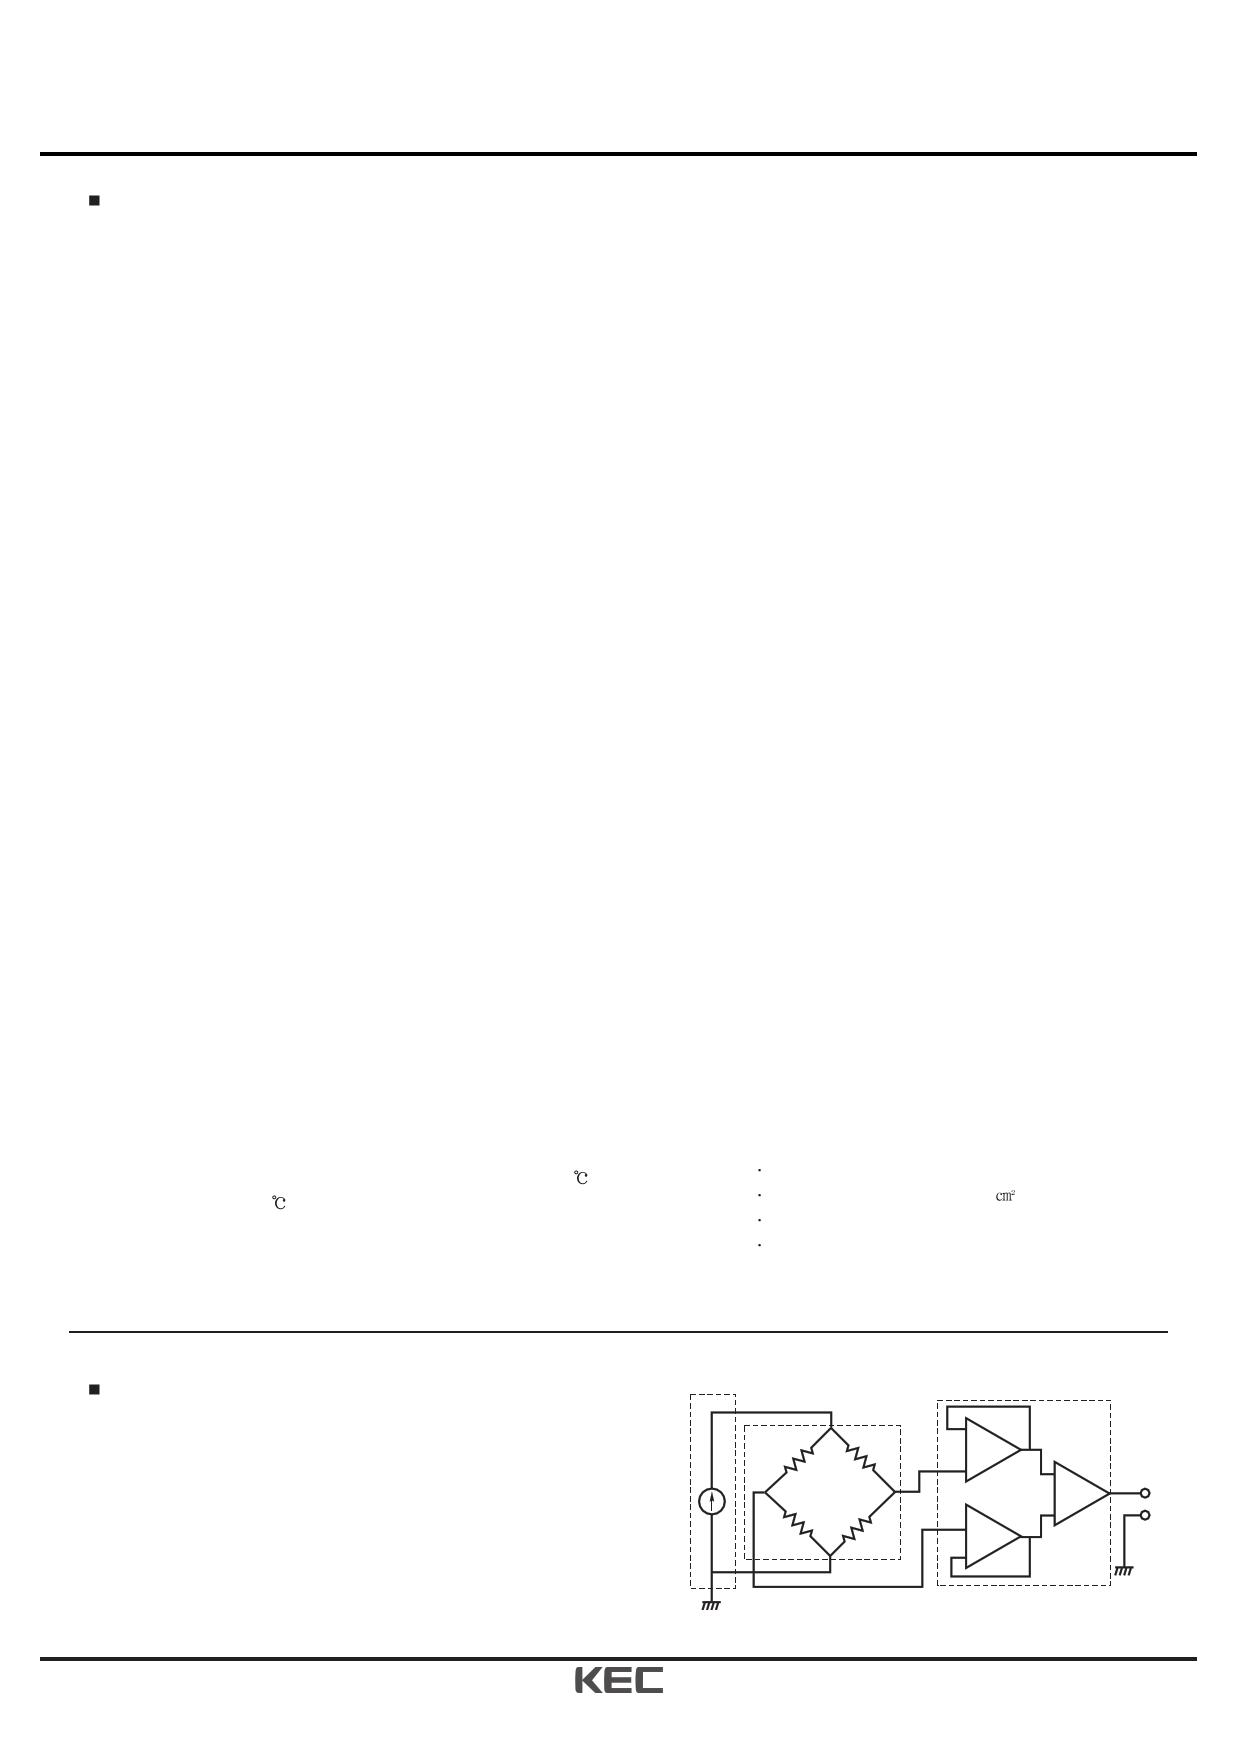 KPF601G01 pdf, 반도체, 판매, 대치품